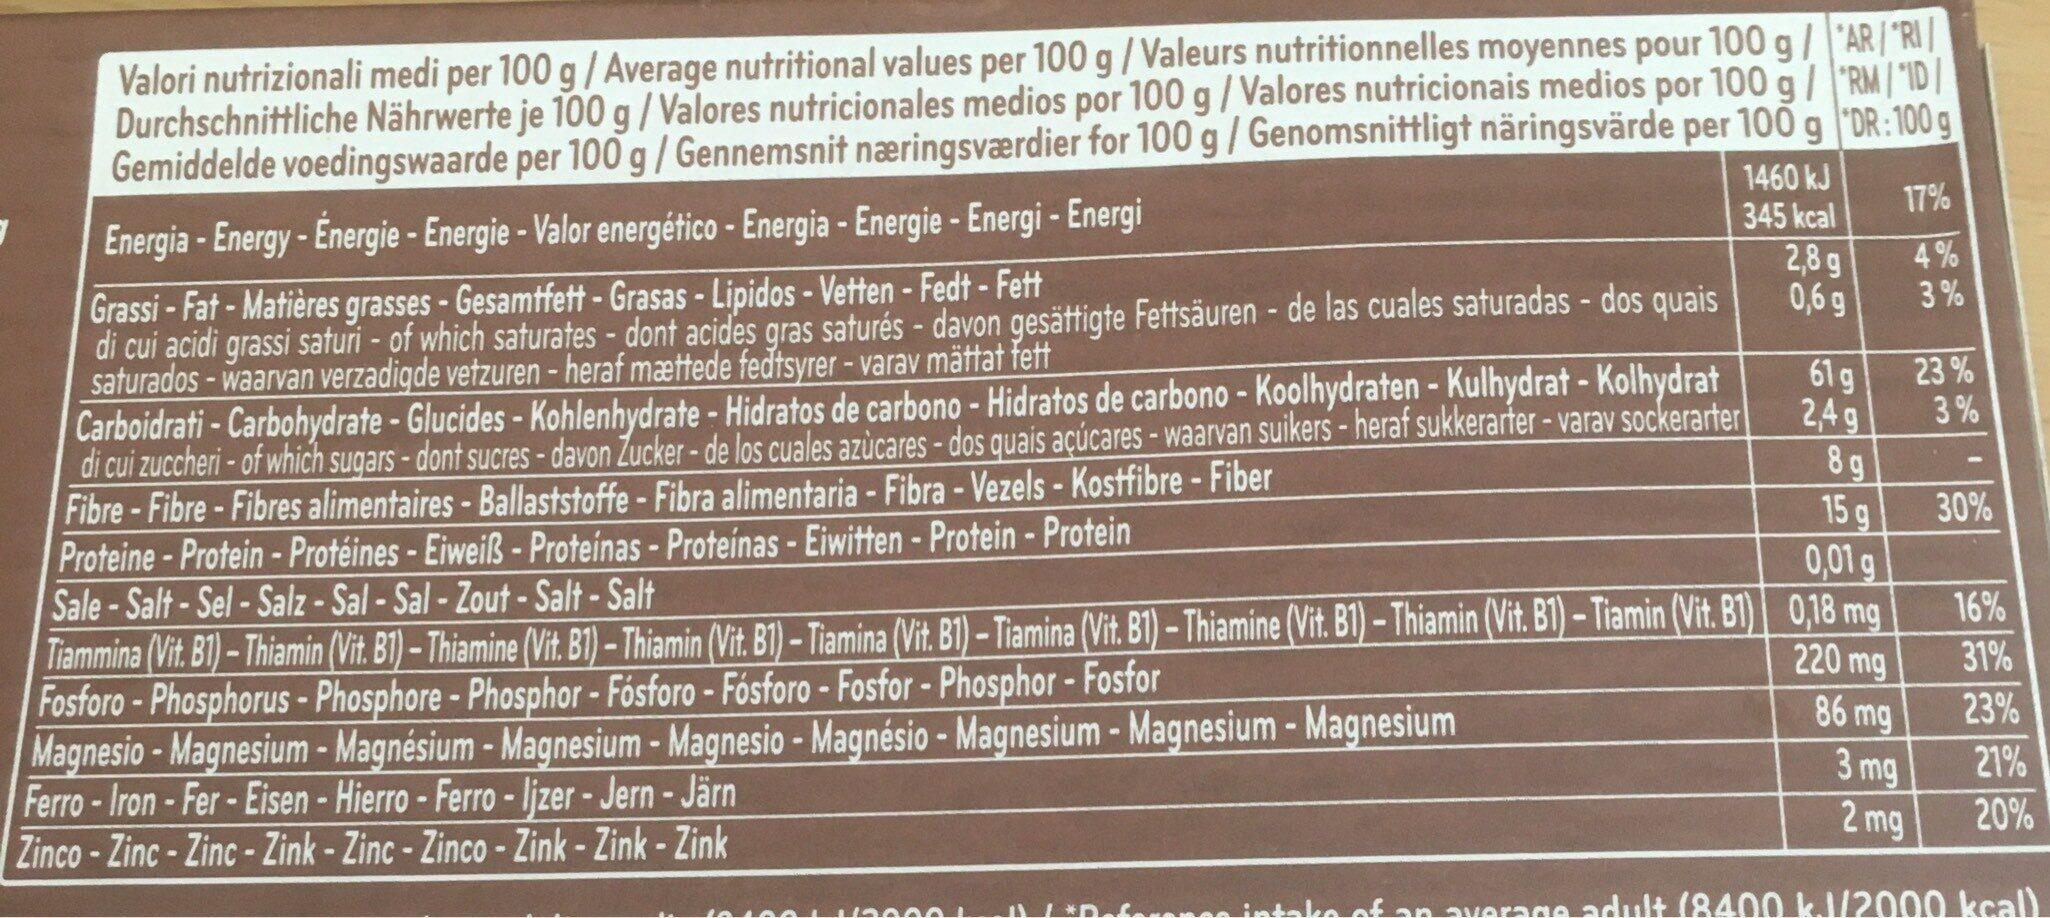 Spaghetti 12 integralli - Informació nutricional - it